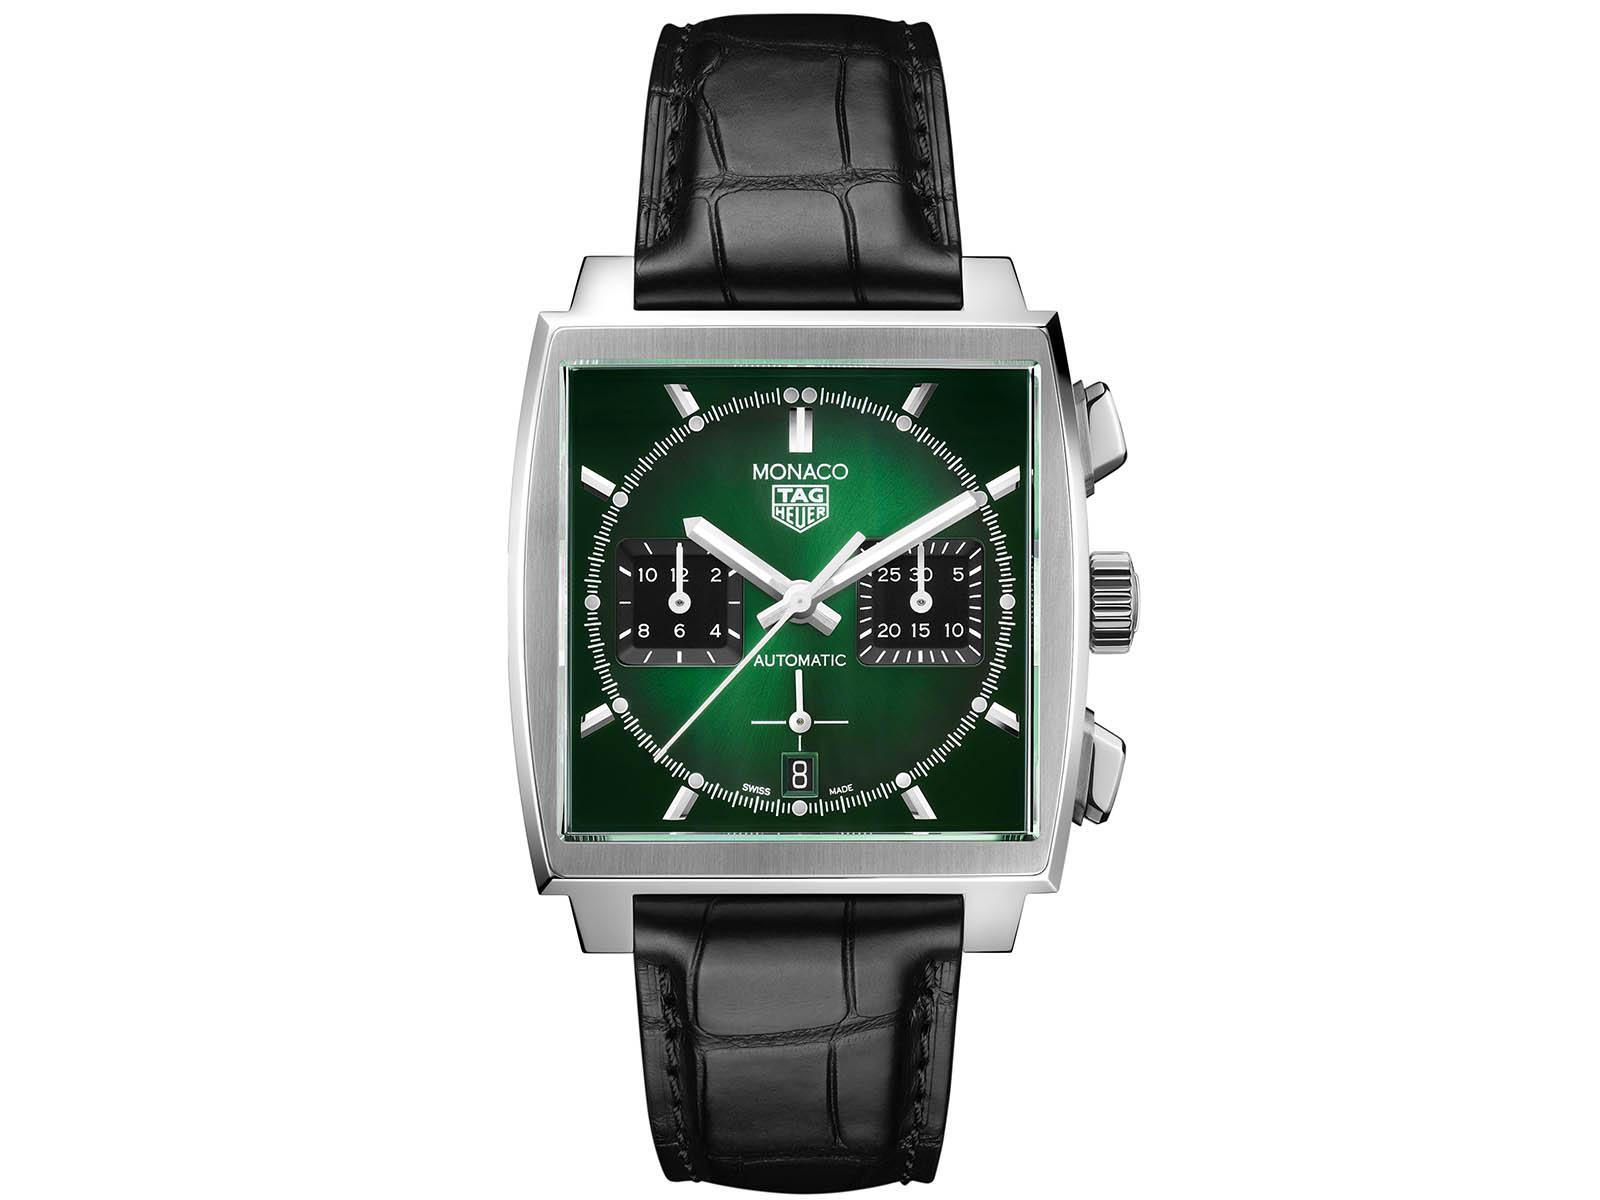 cbl2116-fc6497-tag-heuer-monaco-green-dial-calibre-heuer-02-limited-edition-7.jpg